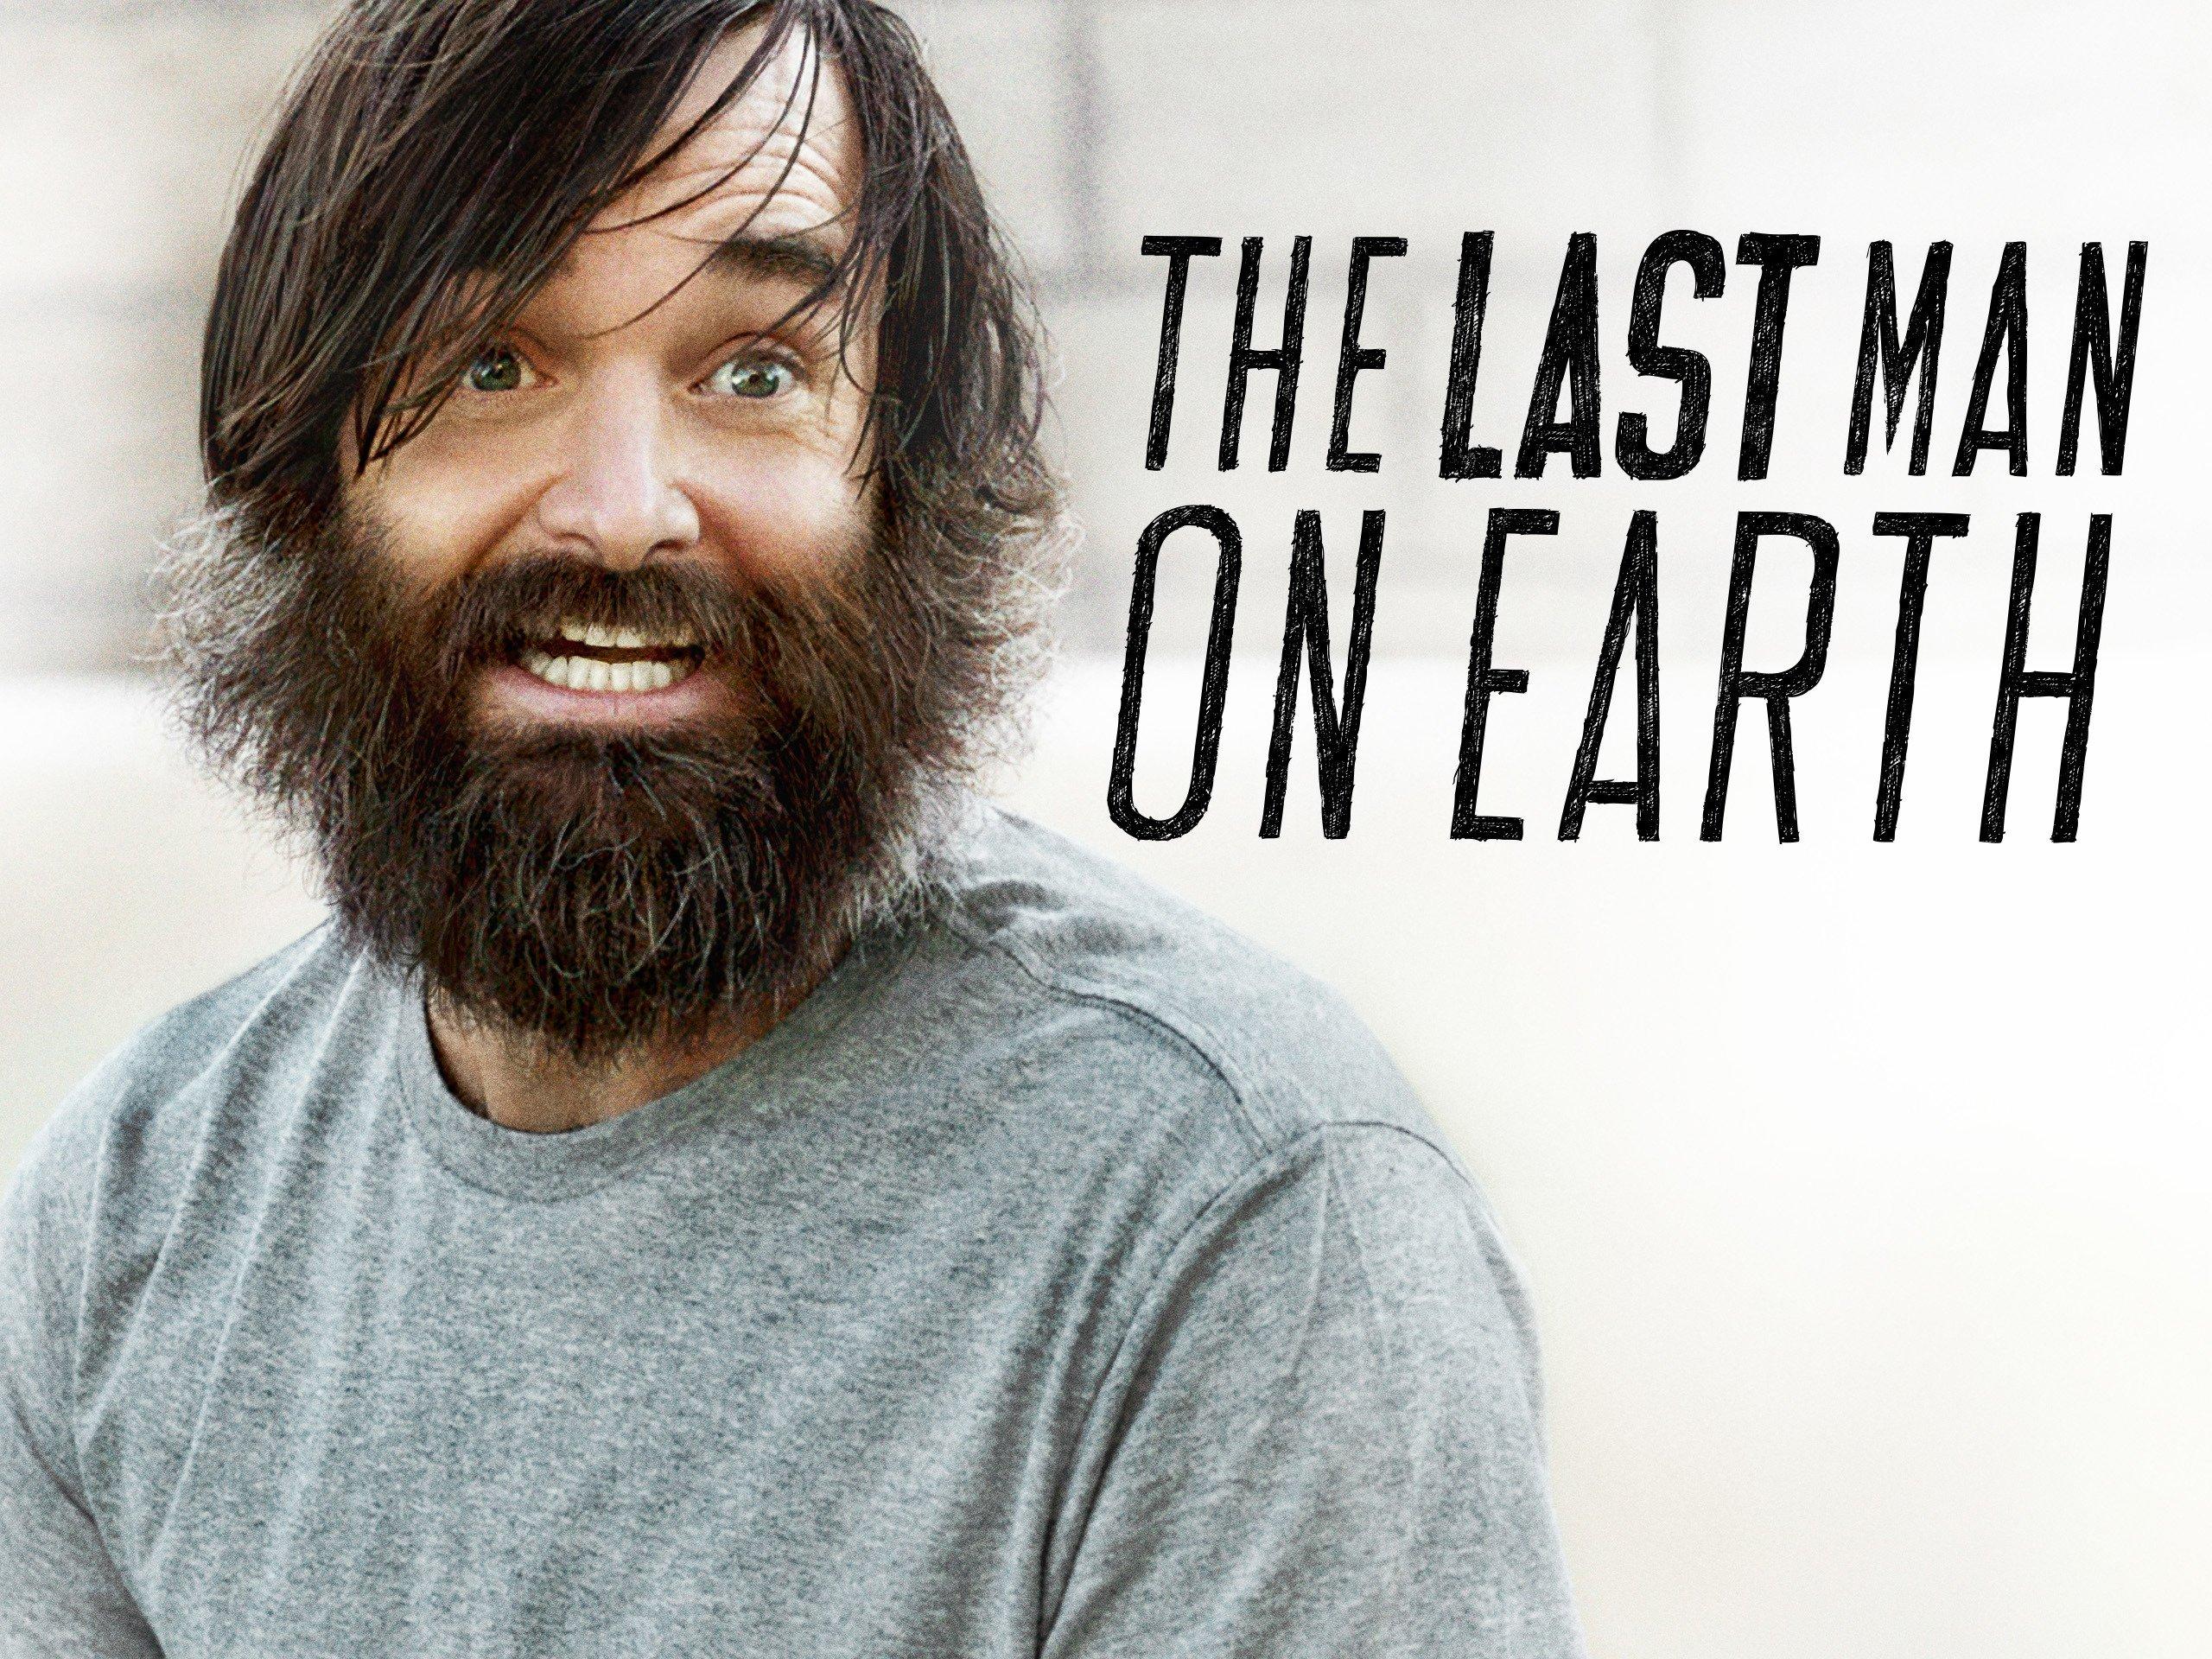 Amazon co uk: Watch The Last Man On Earth Season 1   Prime Video